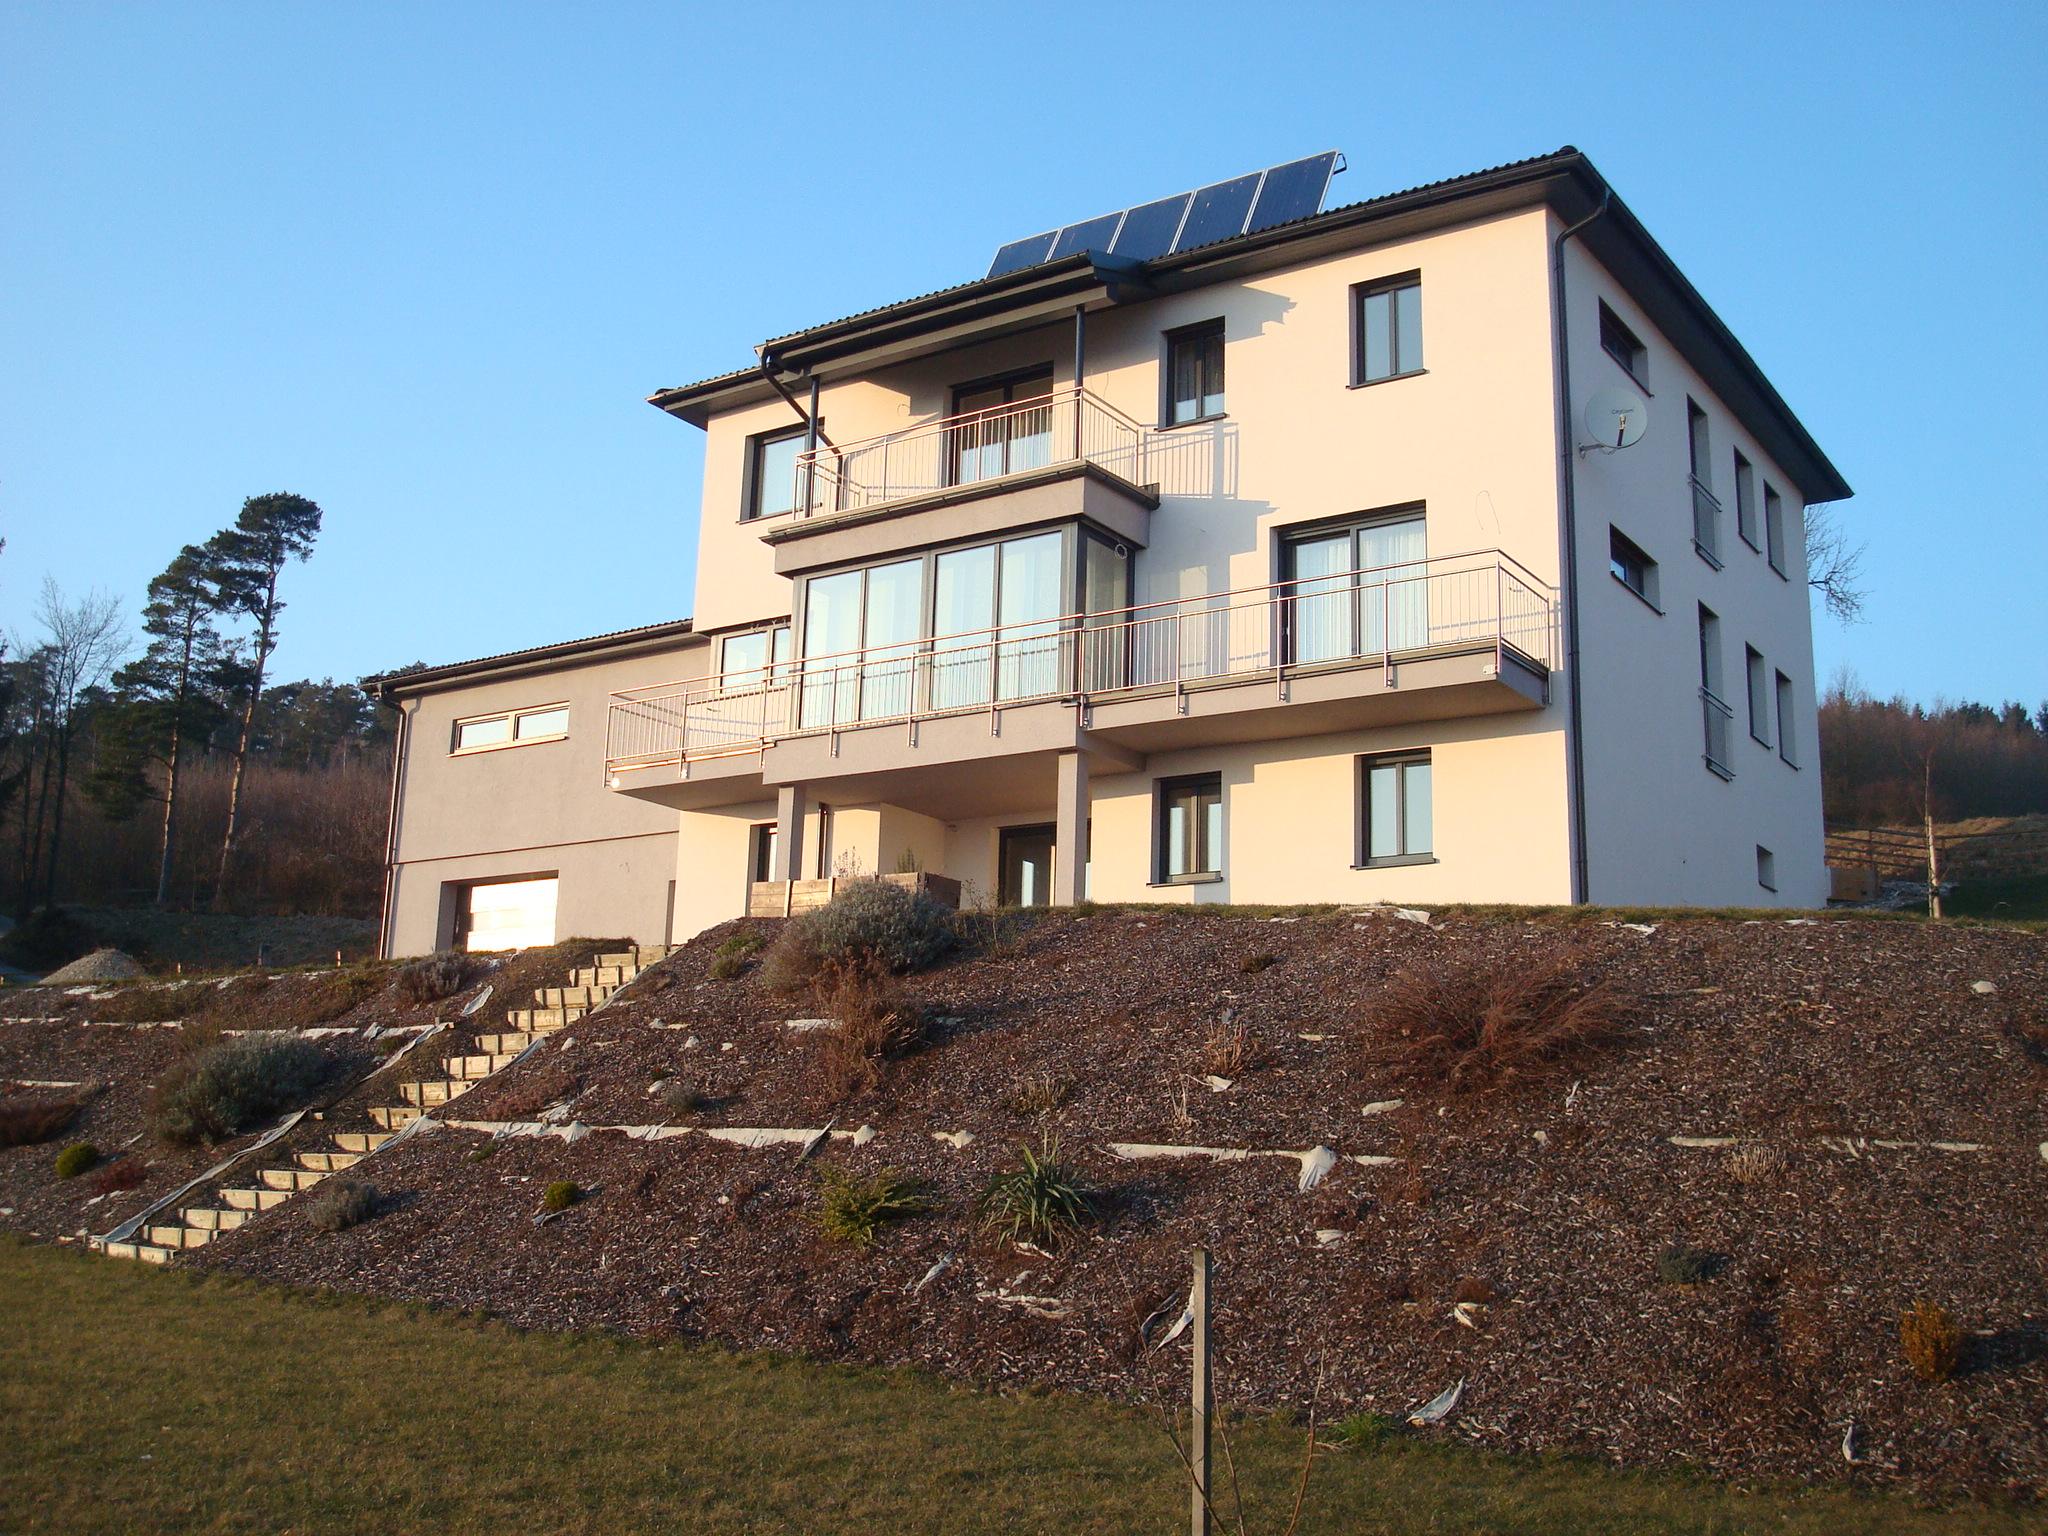 Einfamilienhaus RCH - Neubau